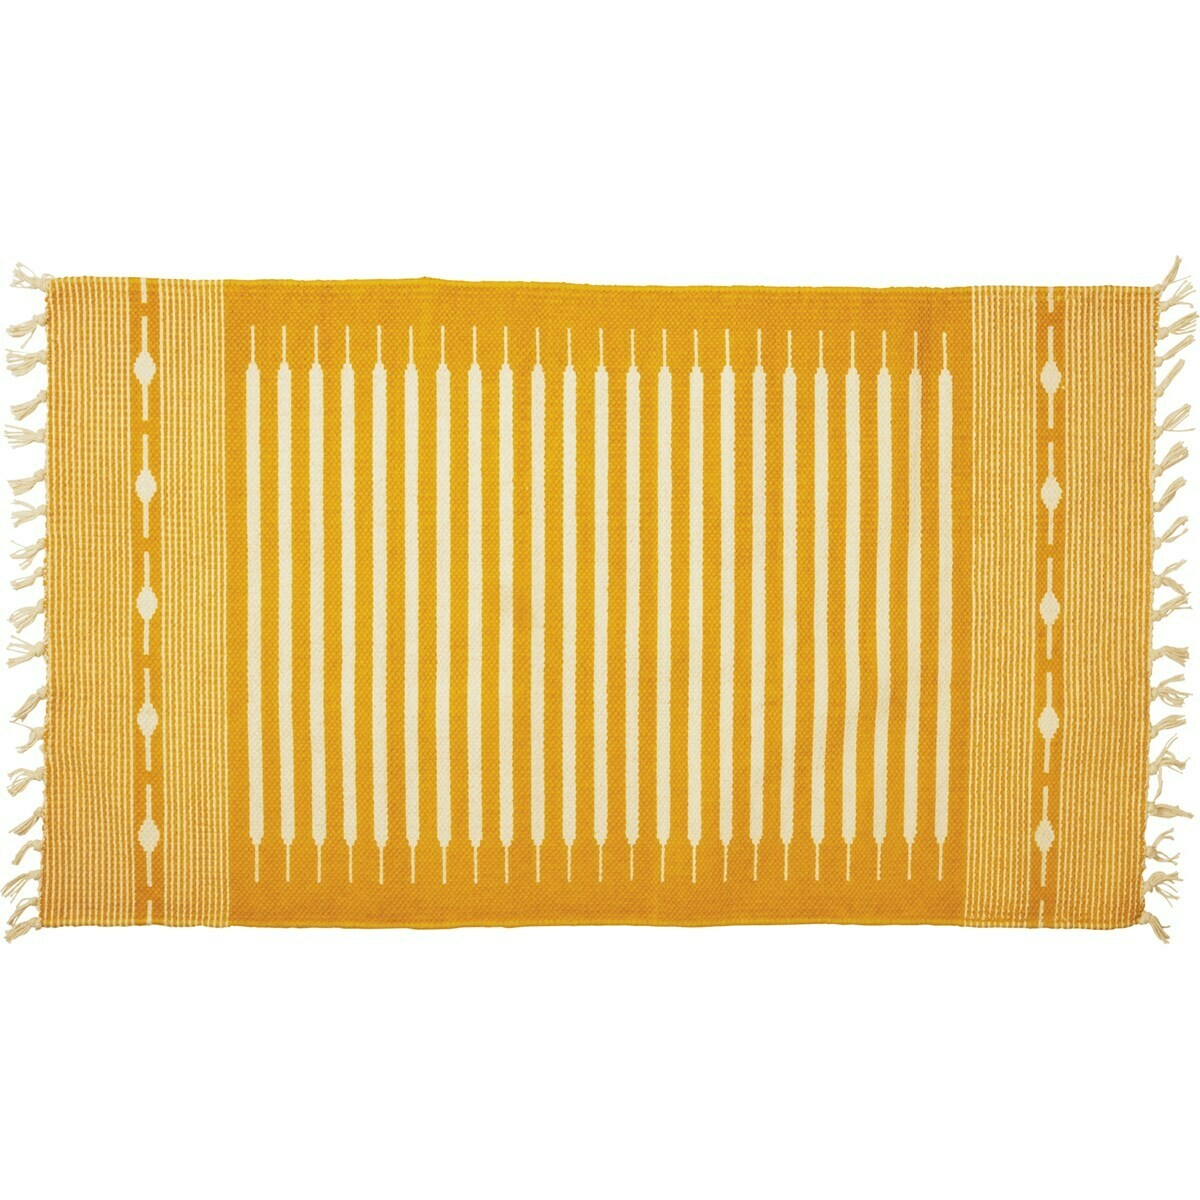 Saffron Striped Rug